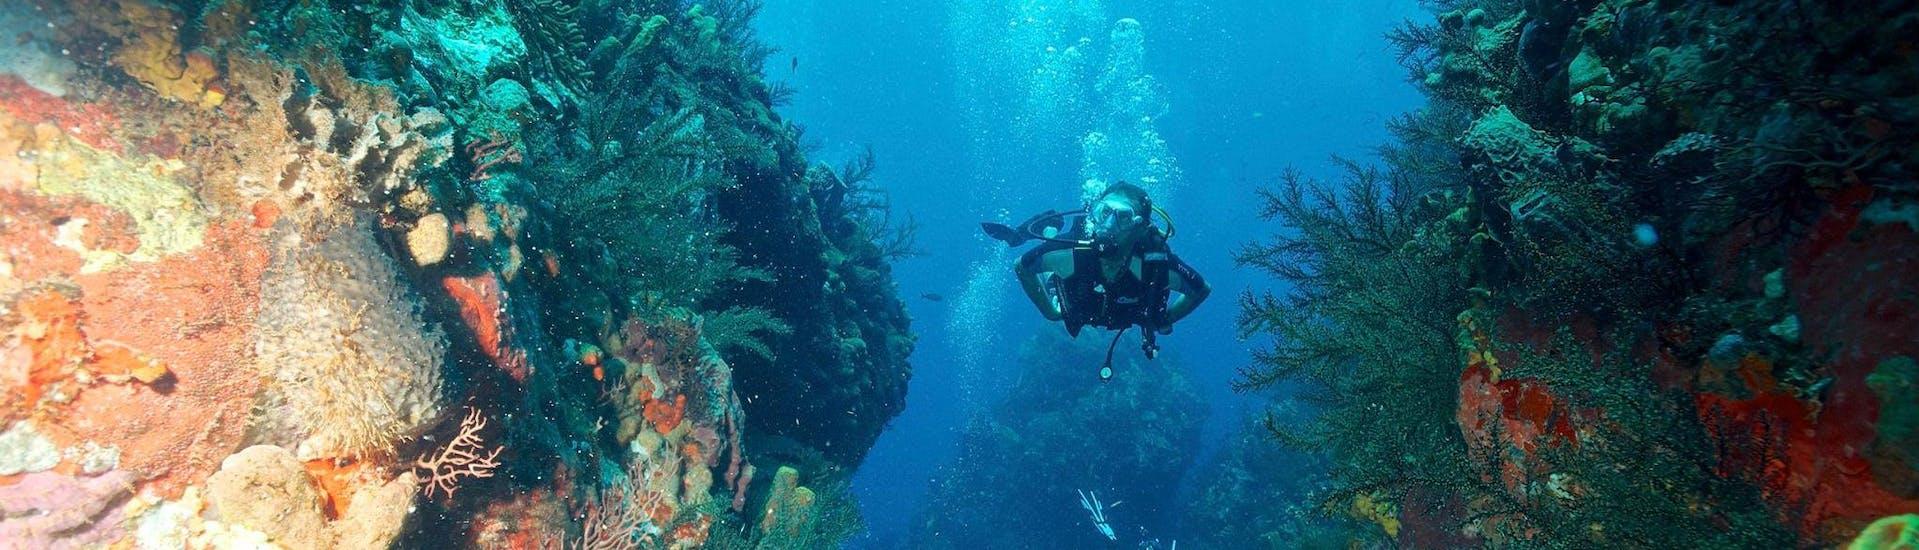 Scuba Diving Course - PE12 & SSI Scuba Diver